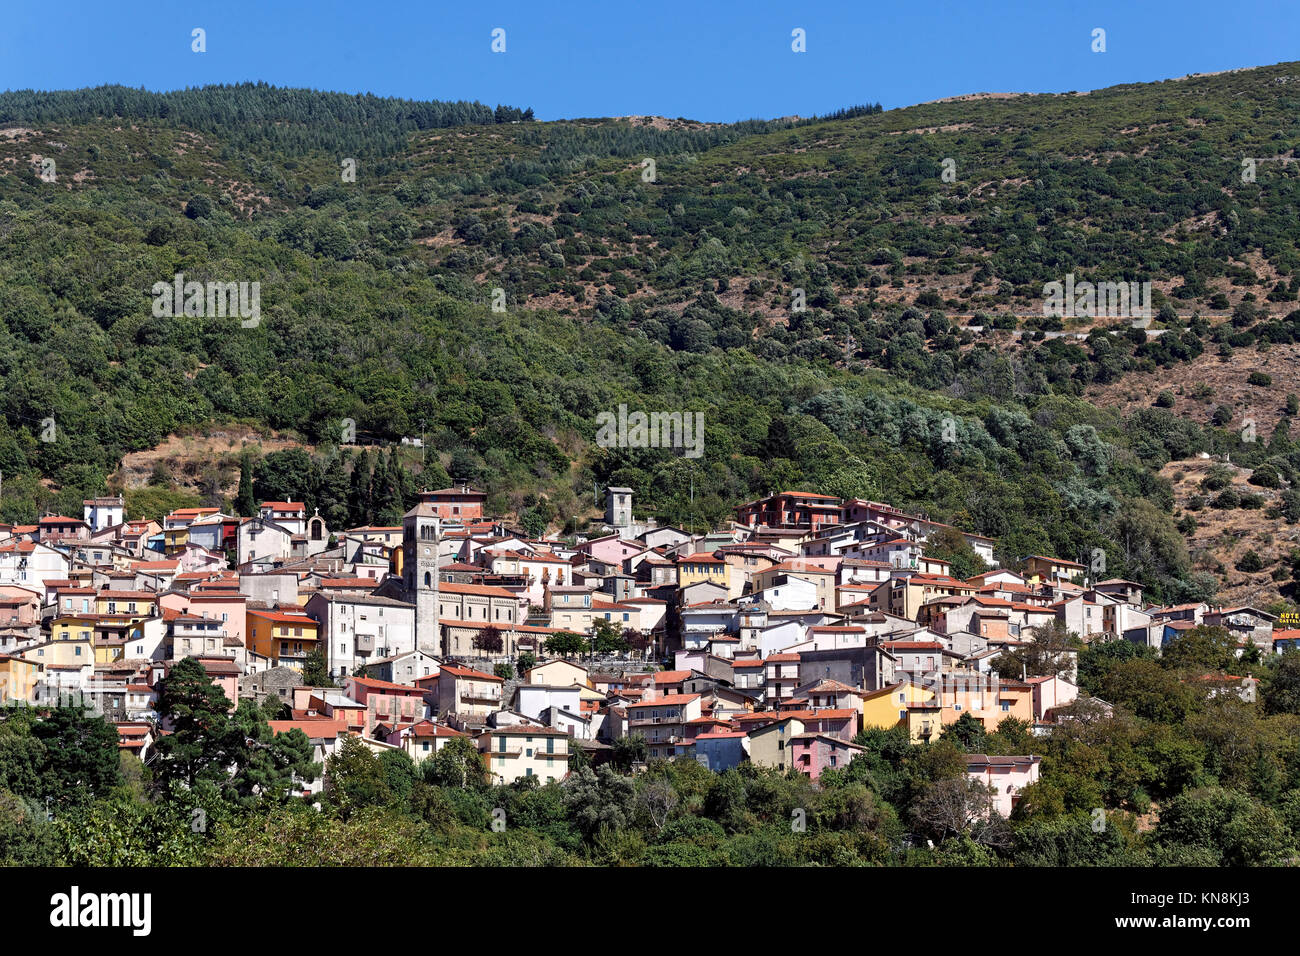 Arizo, Mountain village, Sardinia, Italy - Stock Image